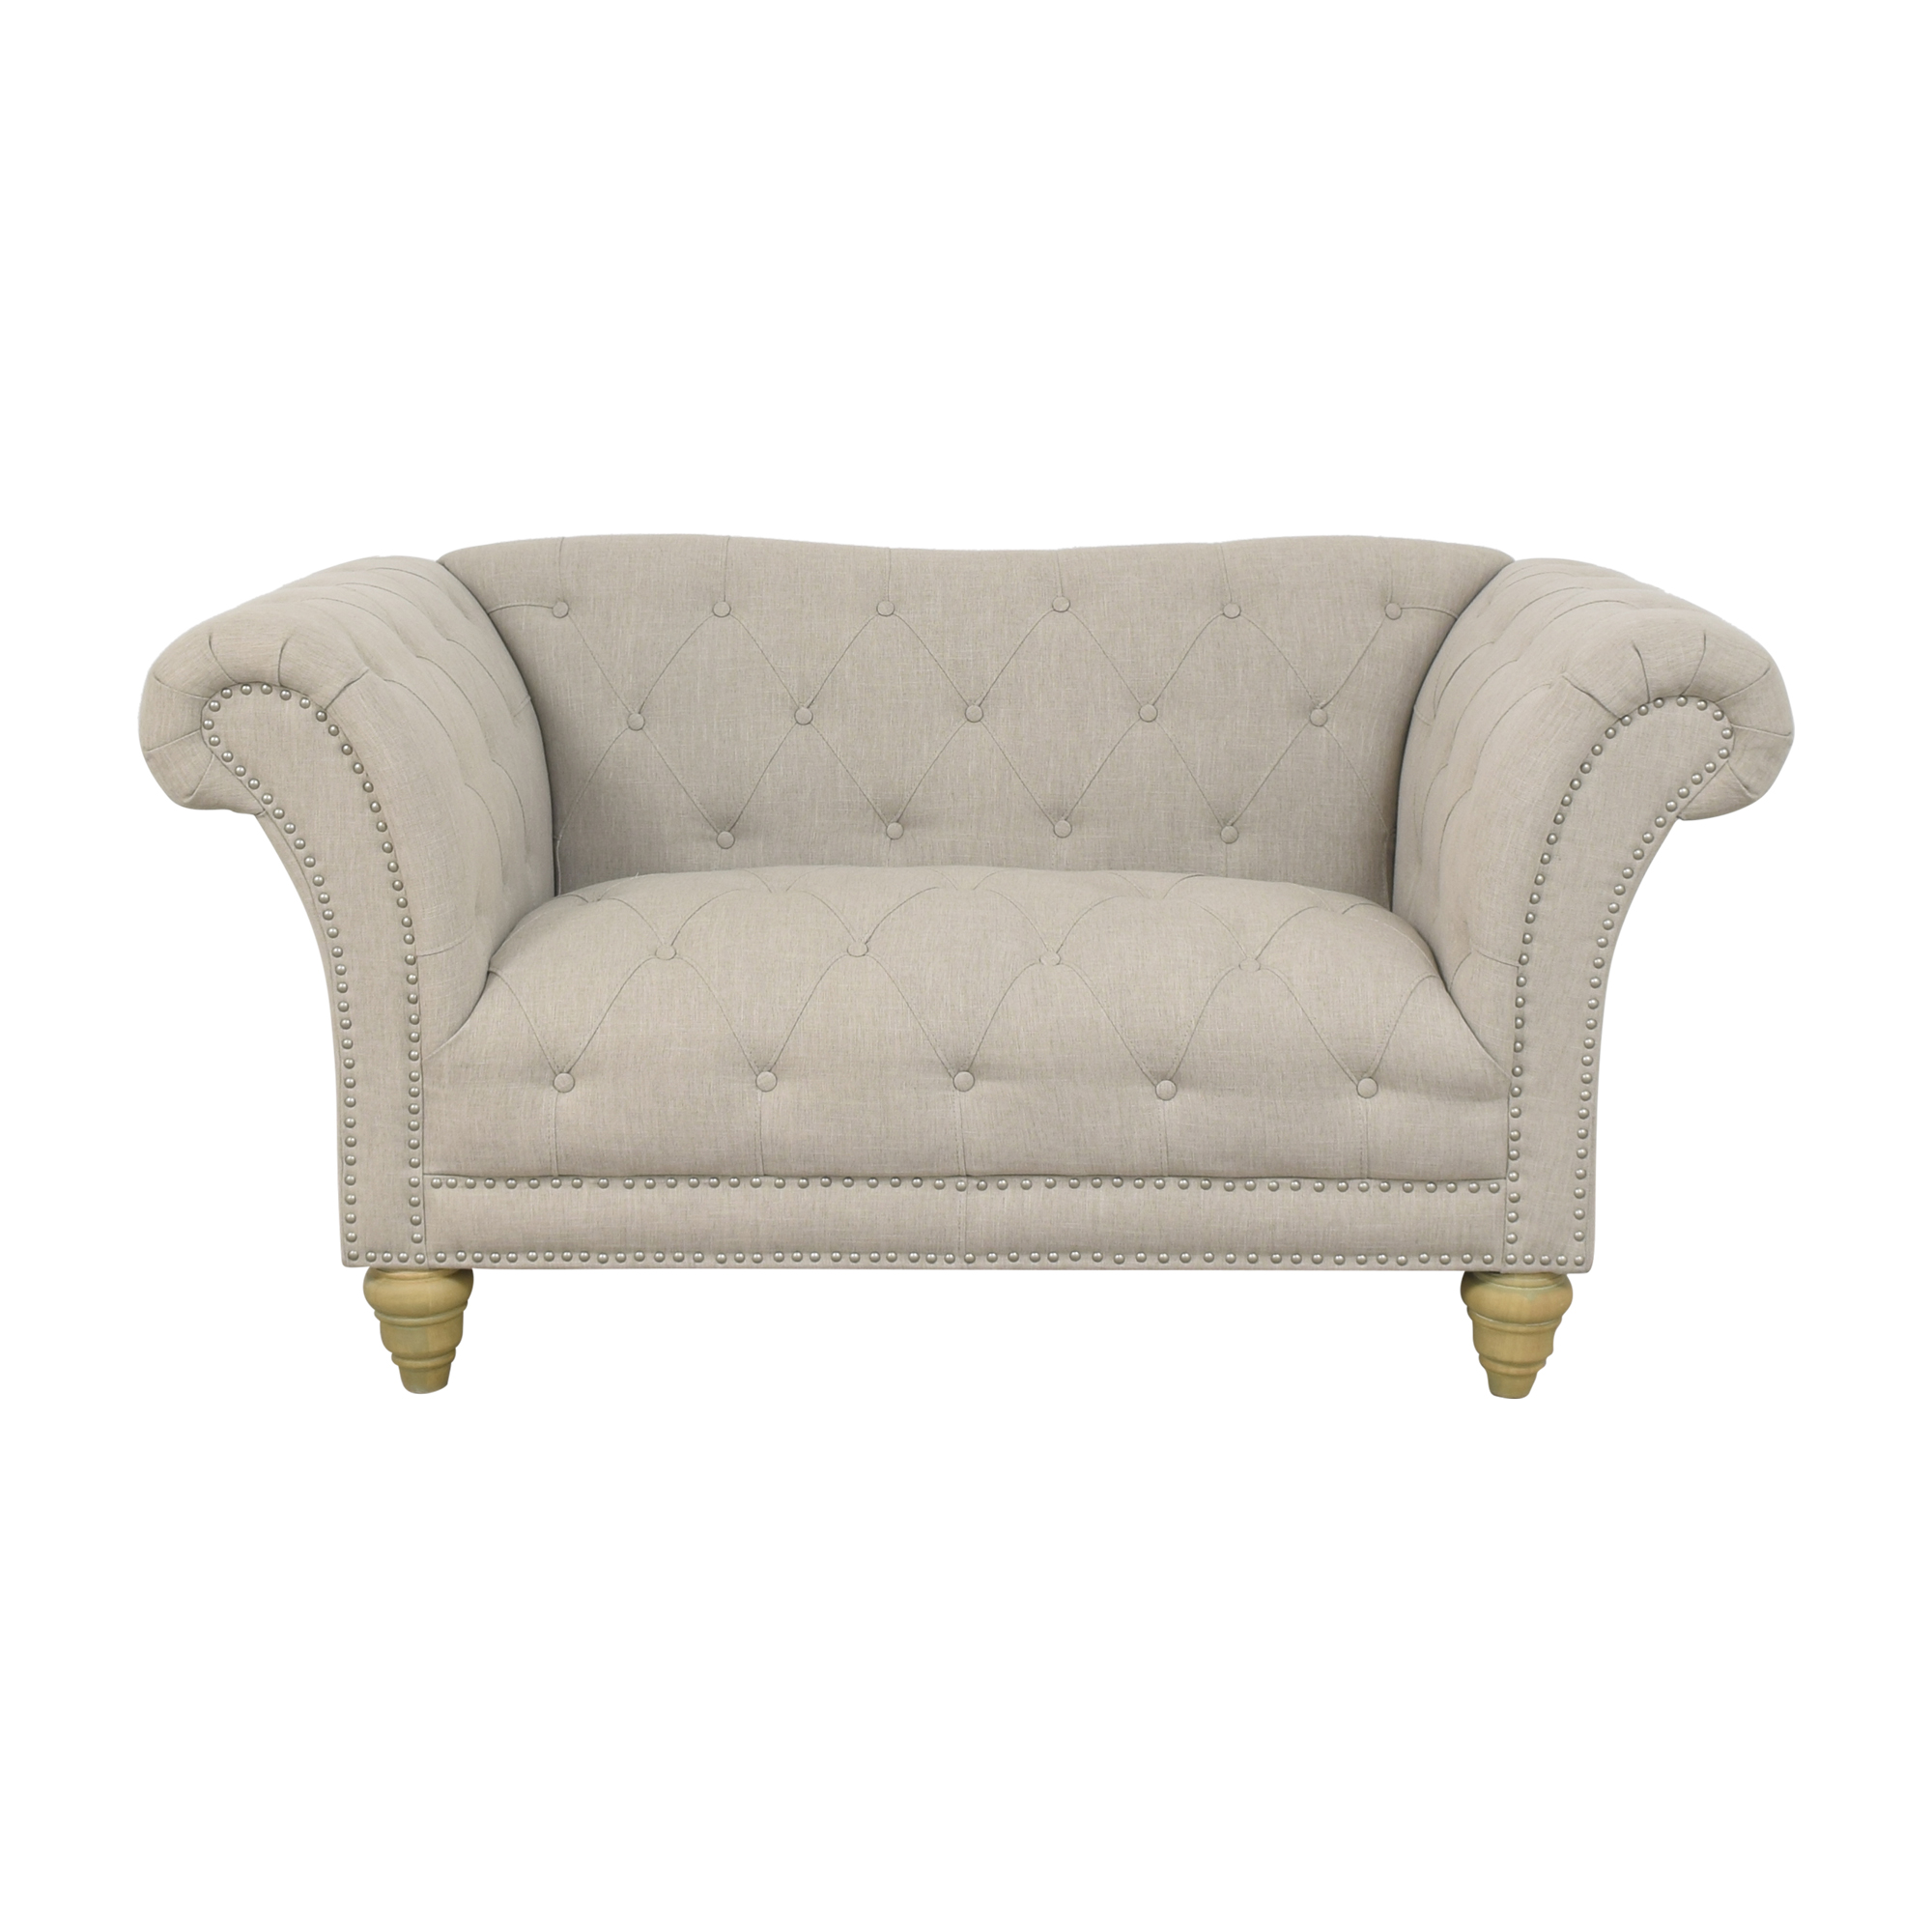 Lark Manor Versailles Chesterfield Settee / Sofas